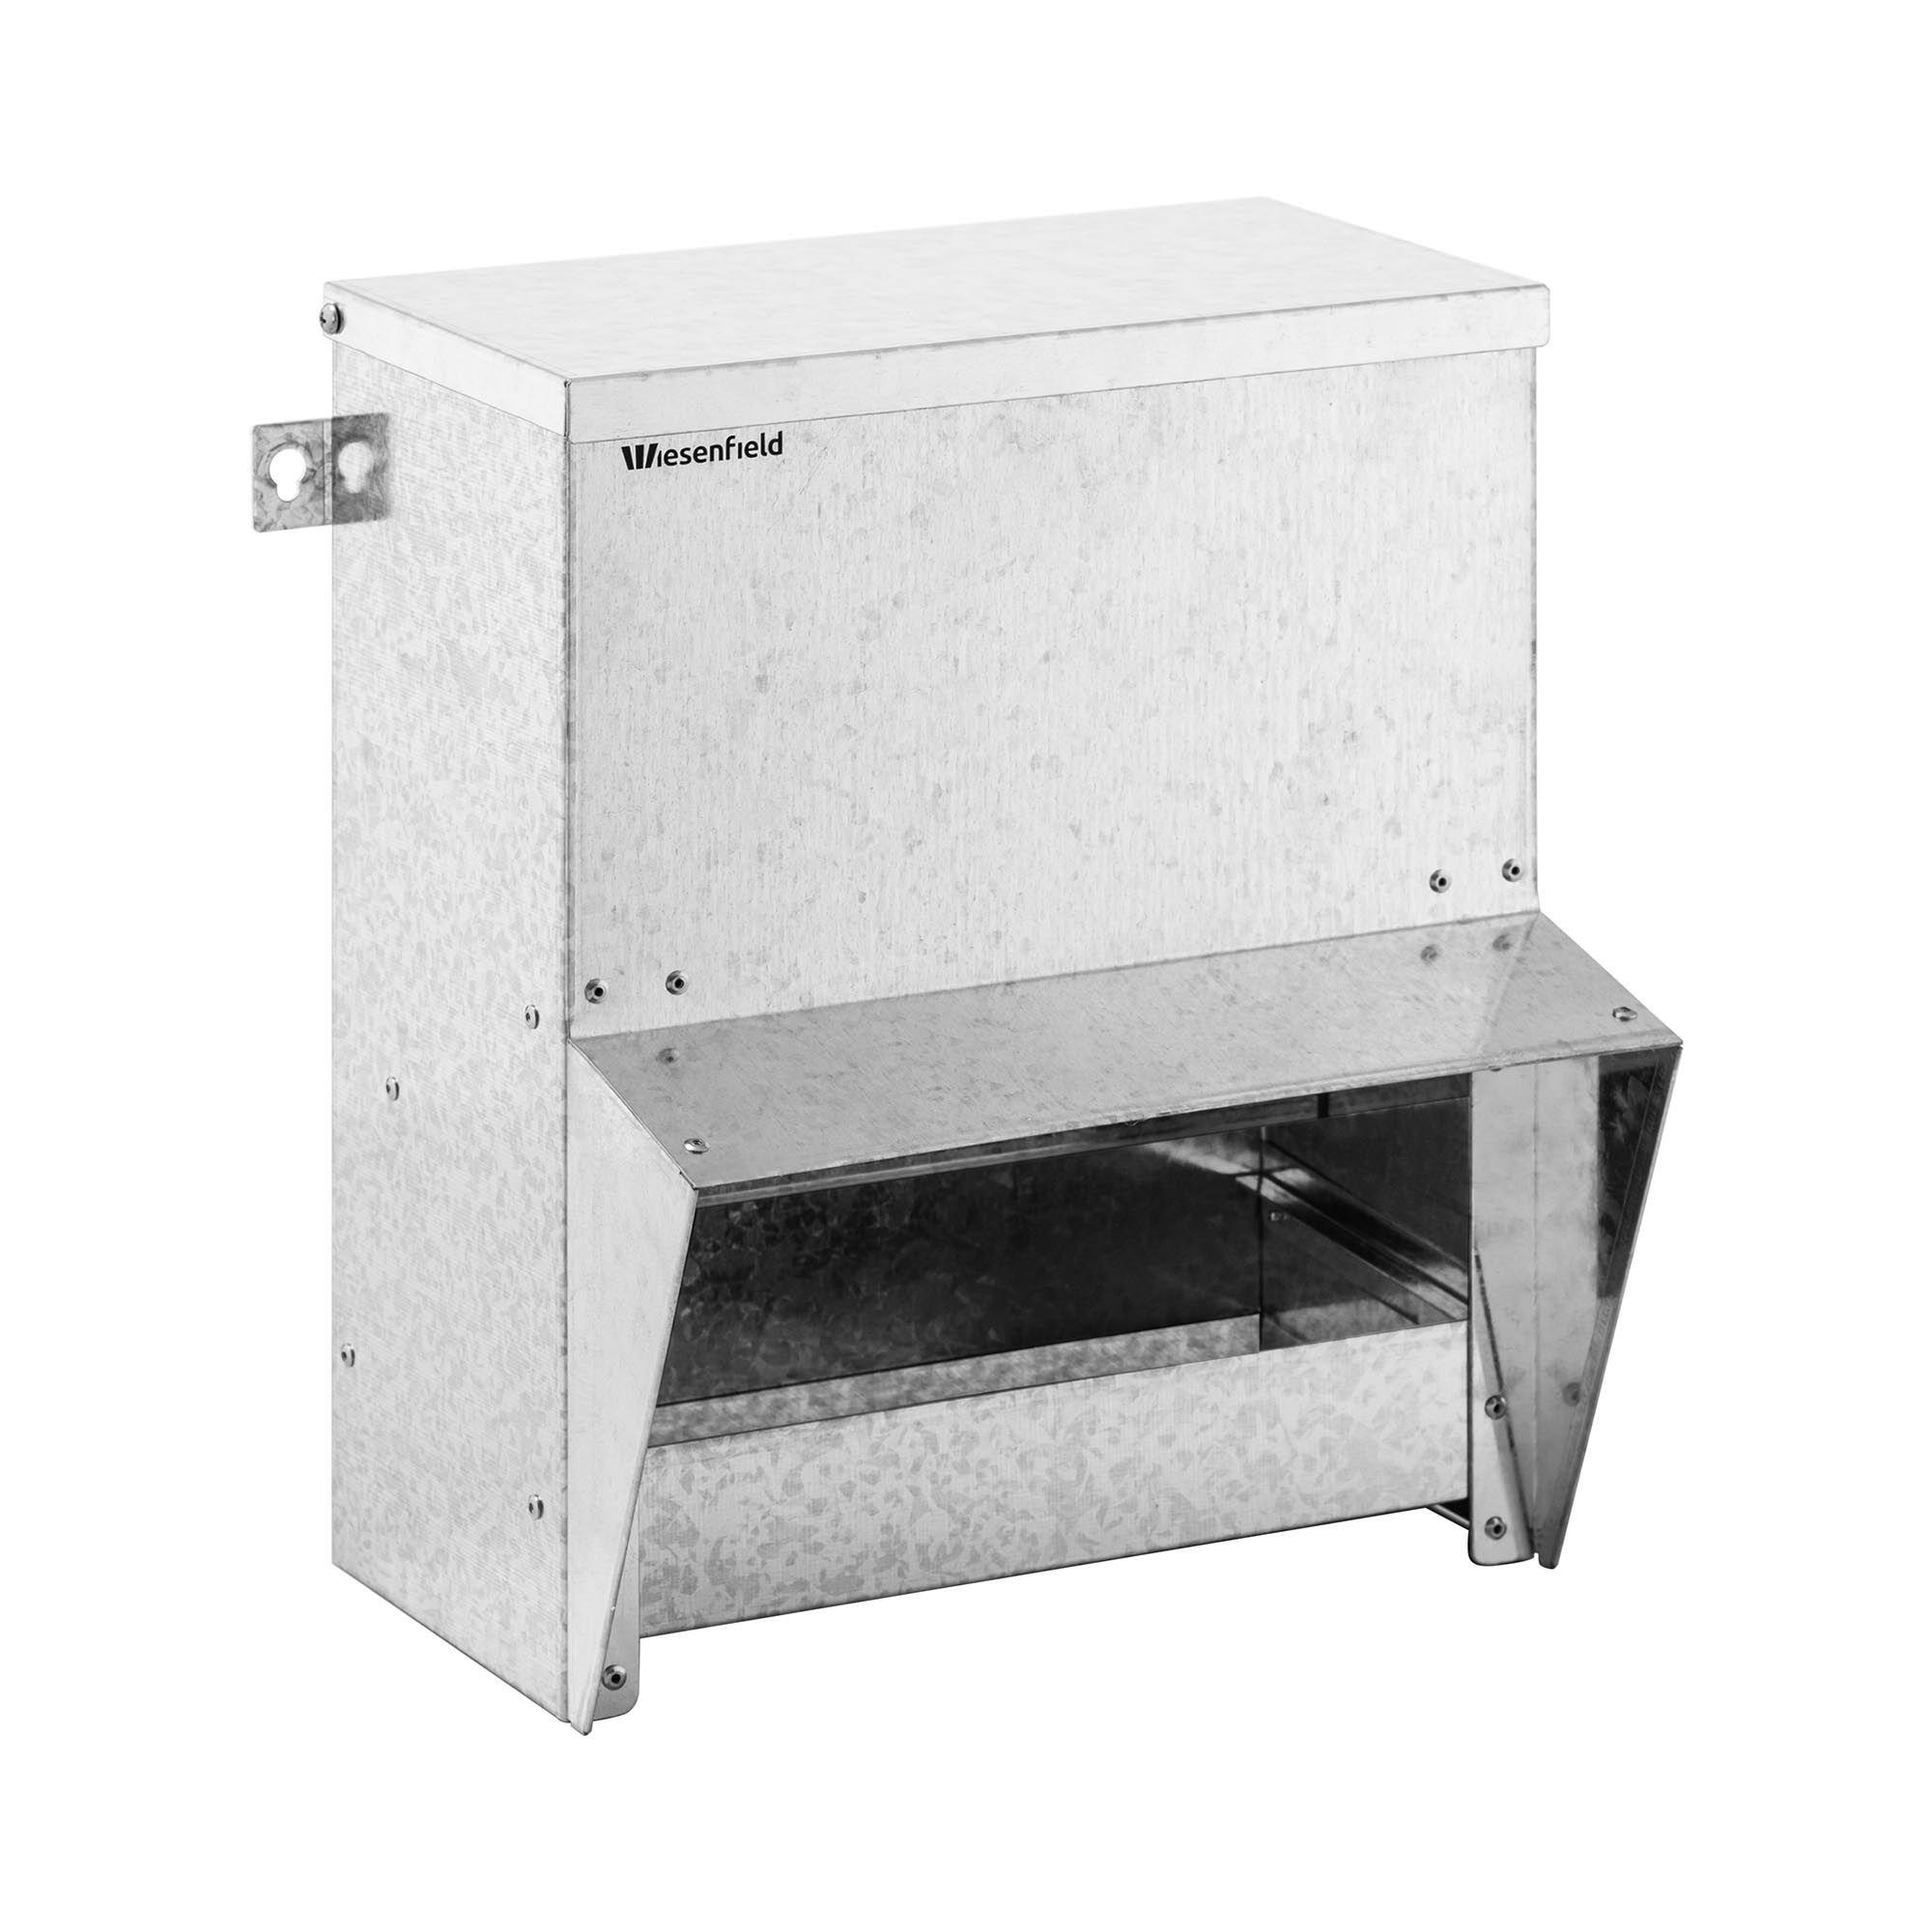 Wiesenfield Mangeoire pour poules - 5 kg WI-CF-130